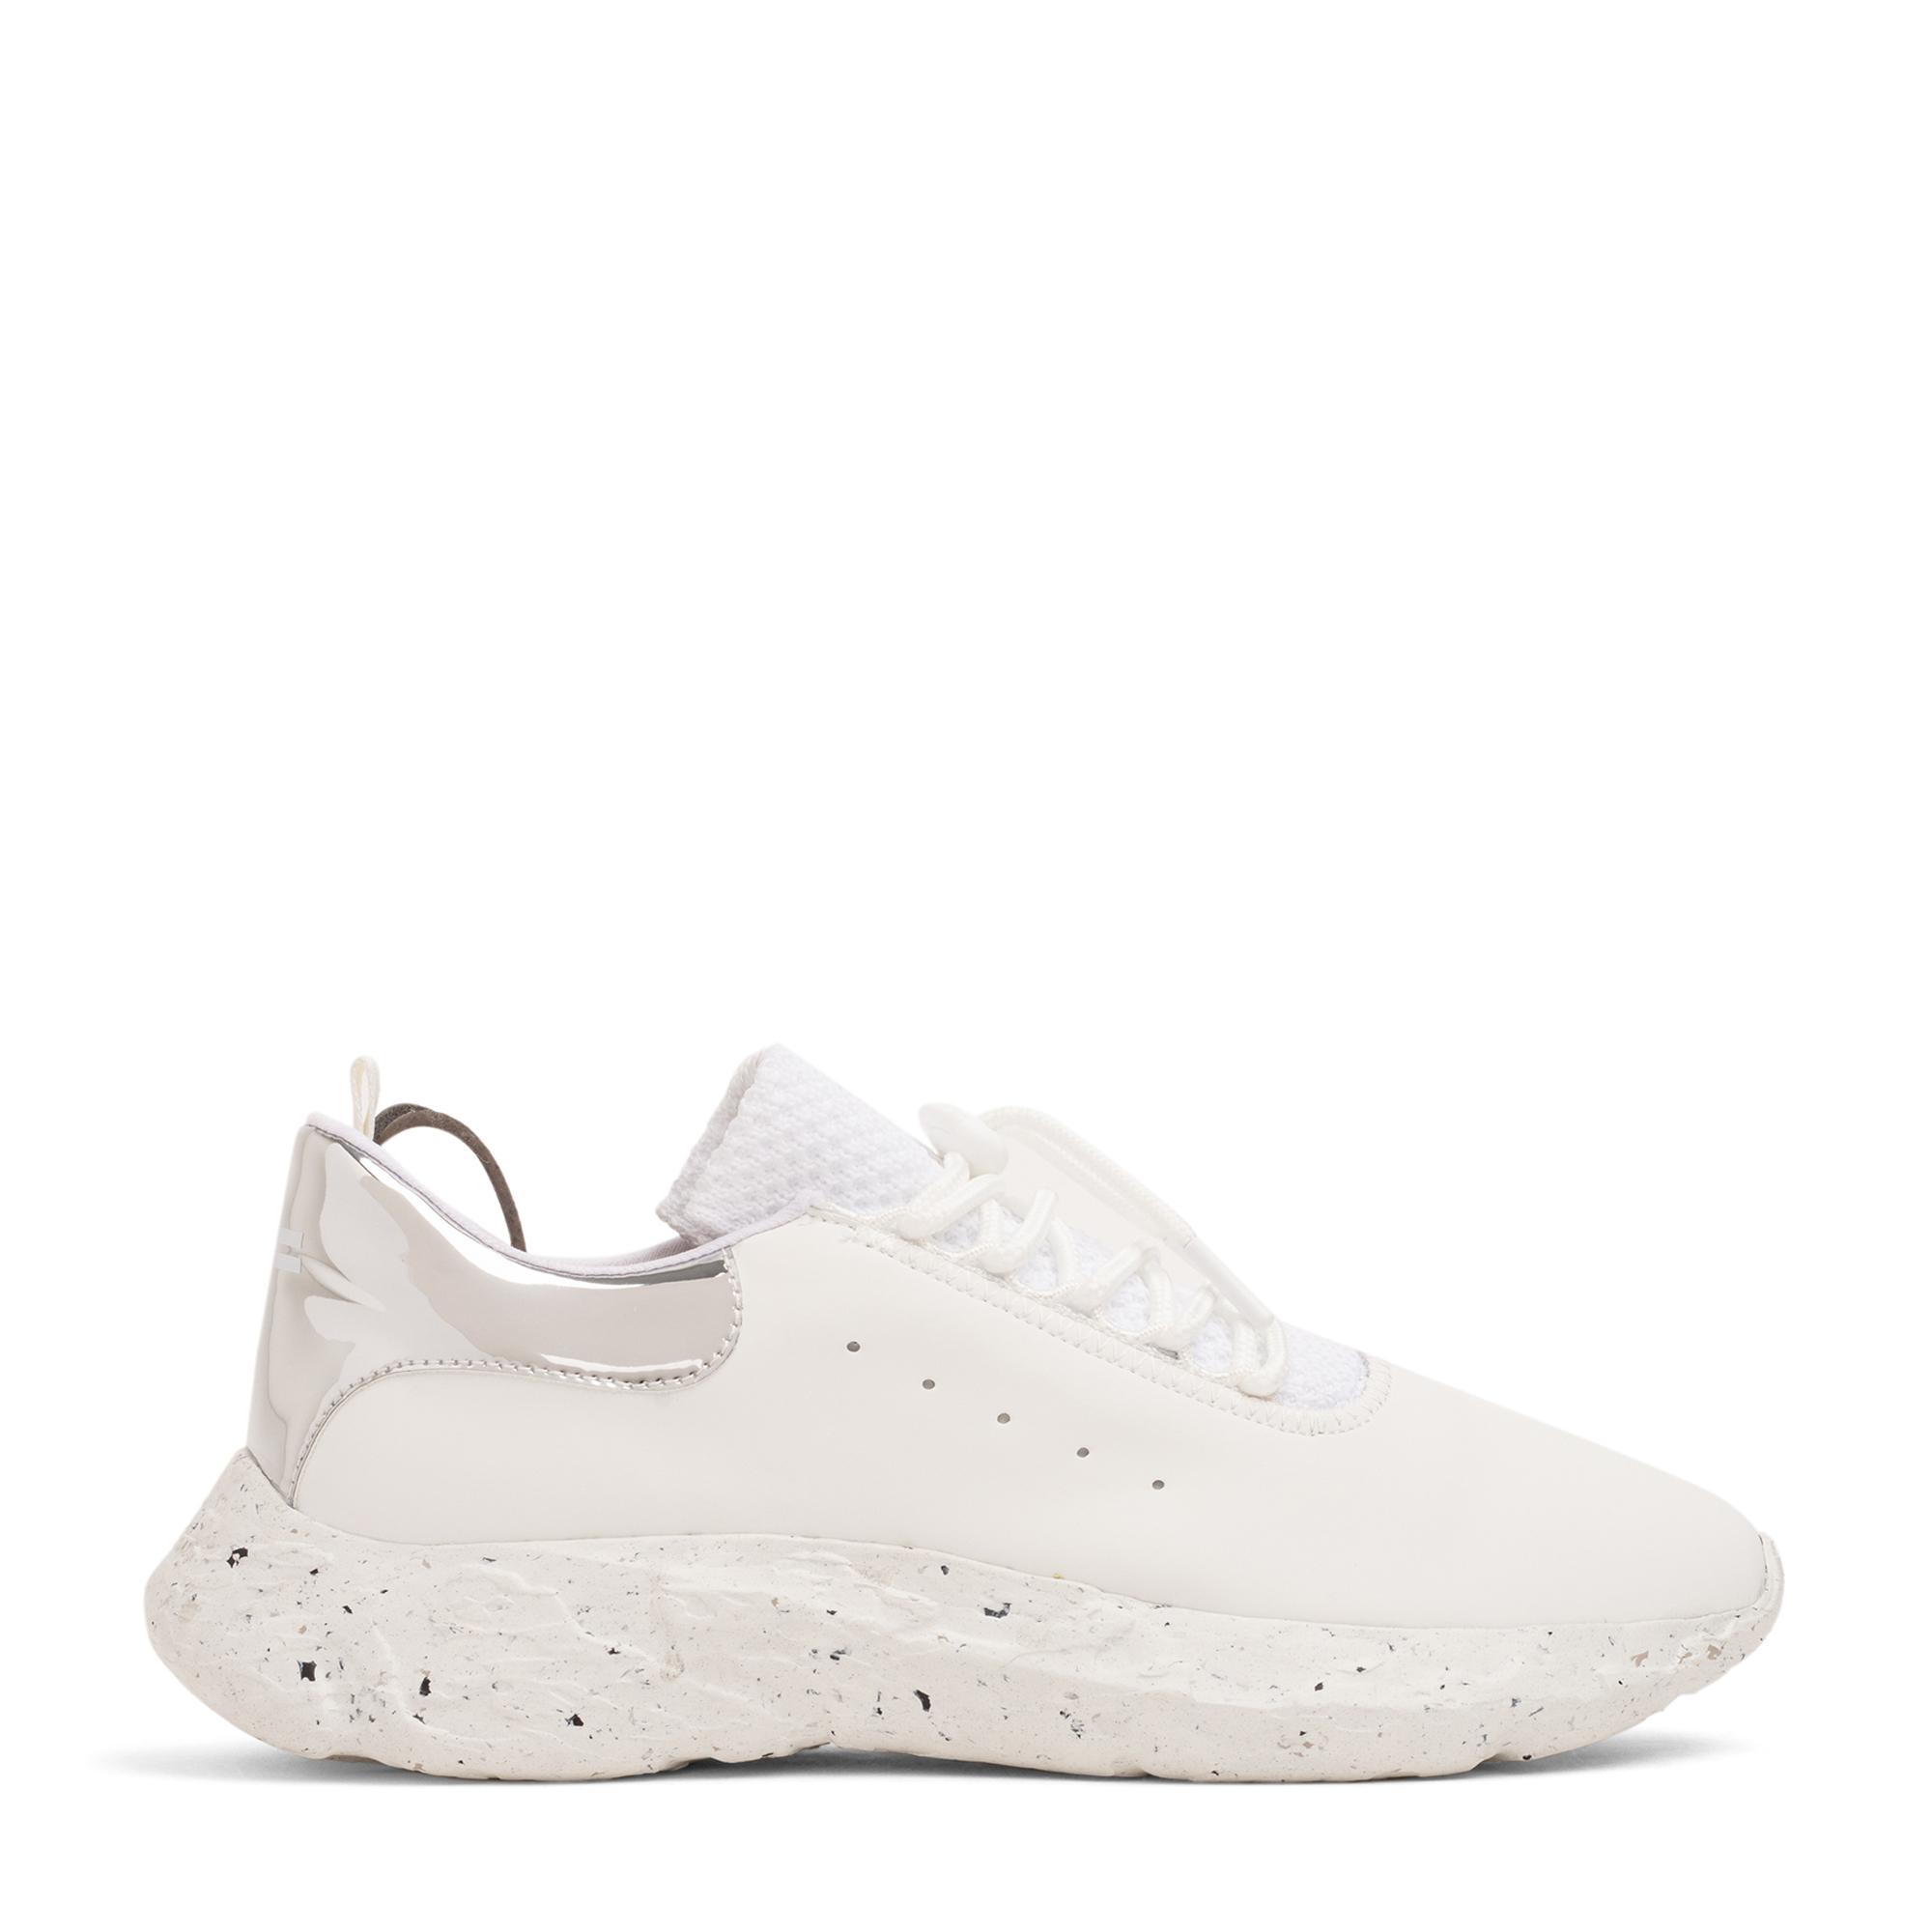 Rock Flap sneakers